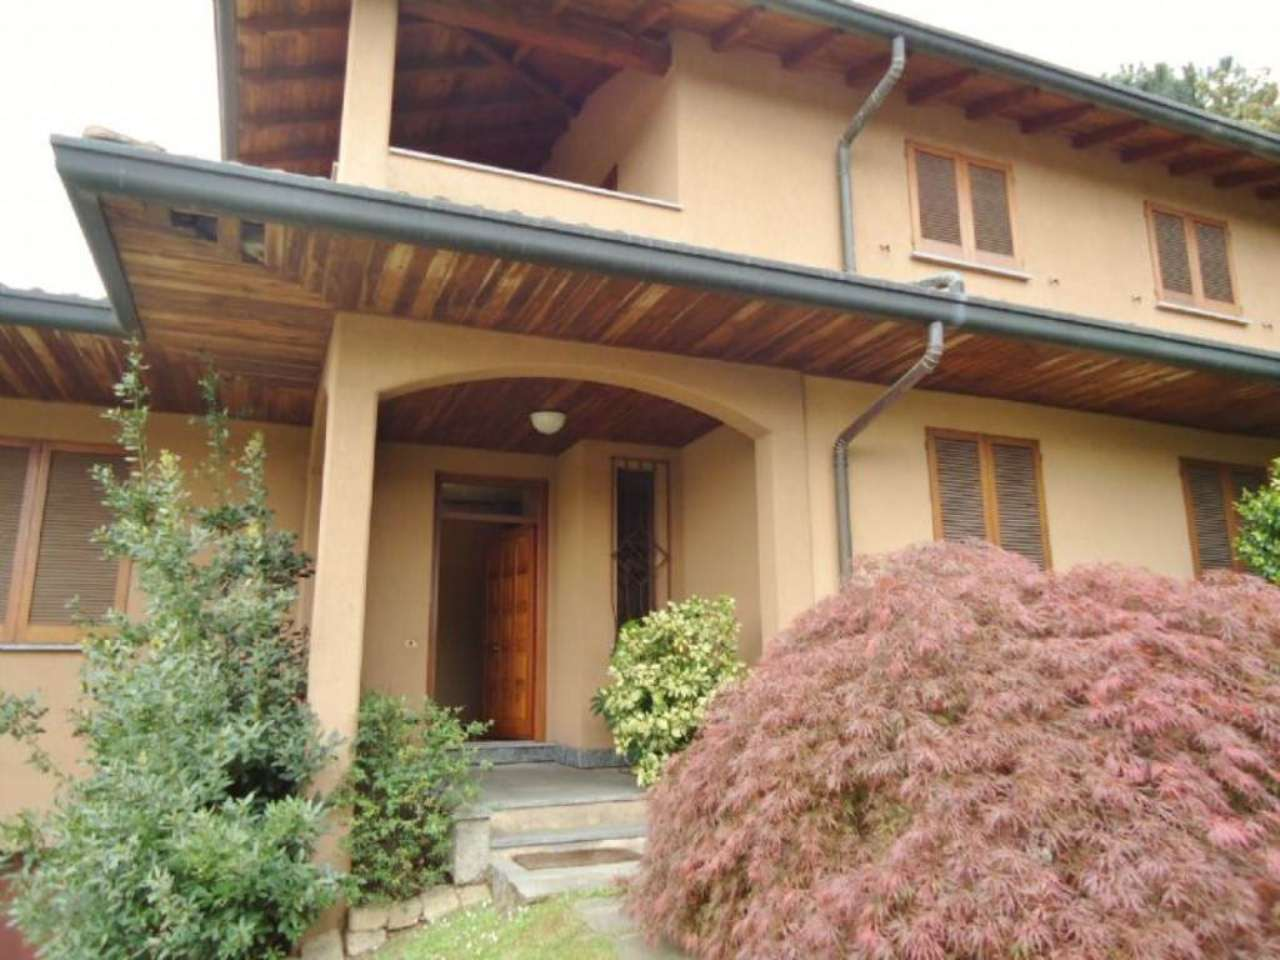 Villa Bifamiliare in Vendita a Buguggiate